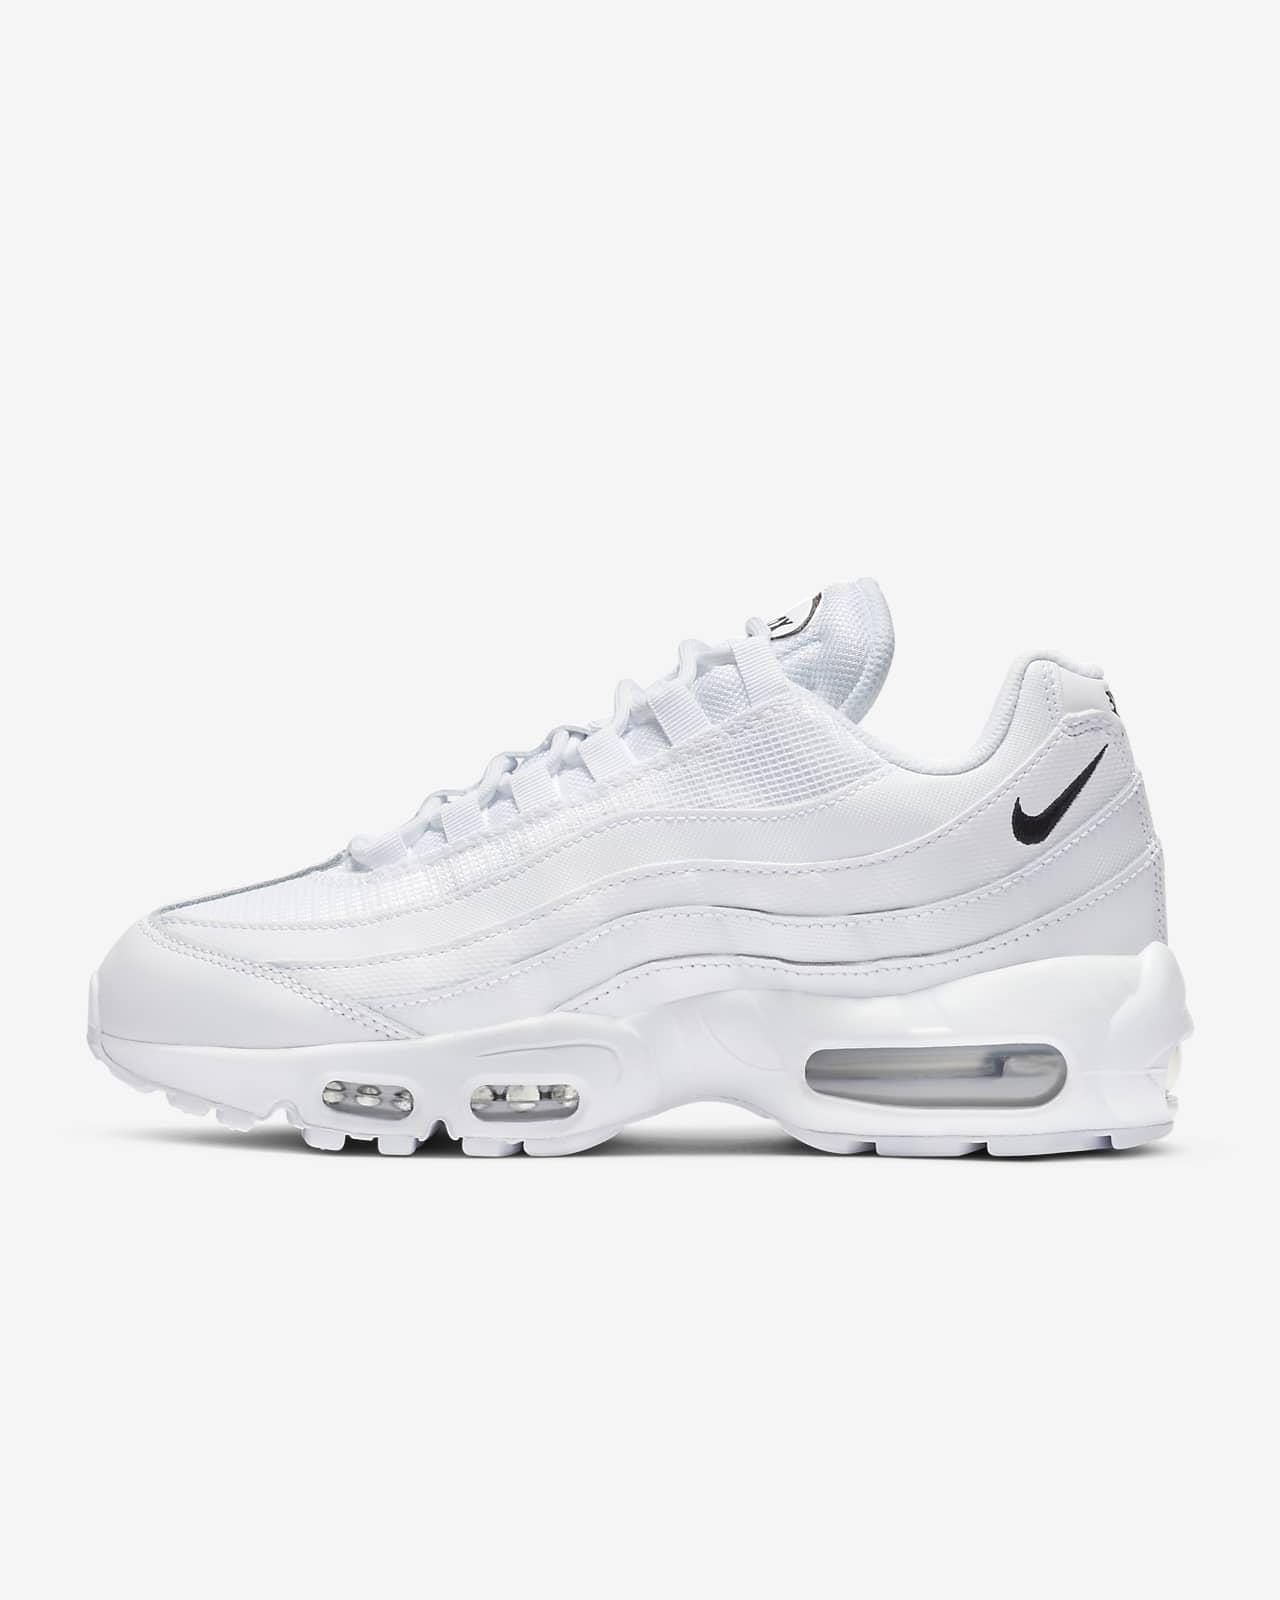 Sko Nike Air Max 95 Essential för kvinnor